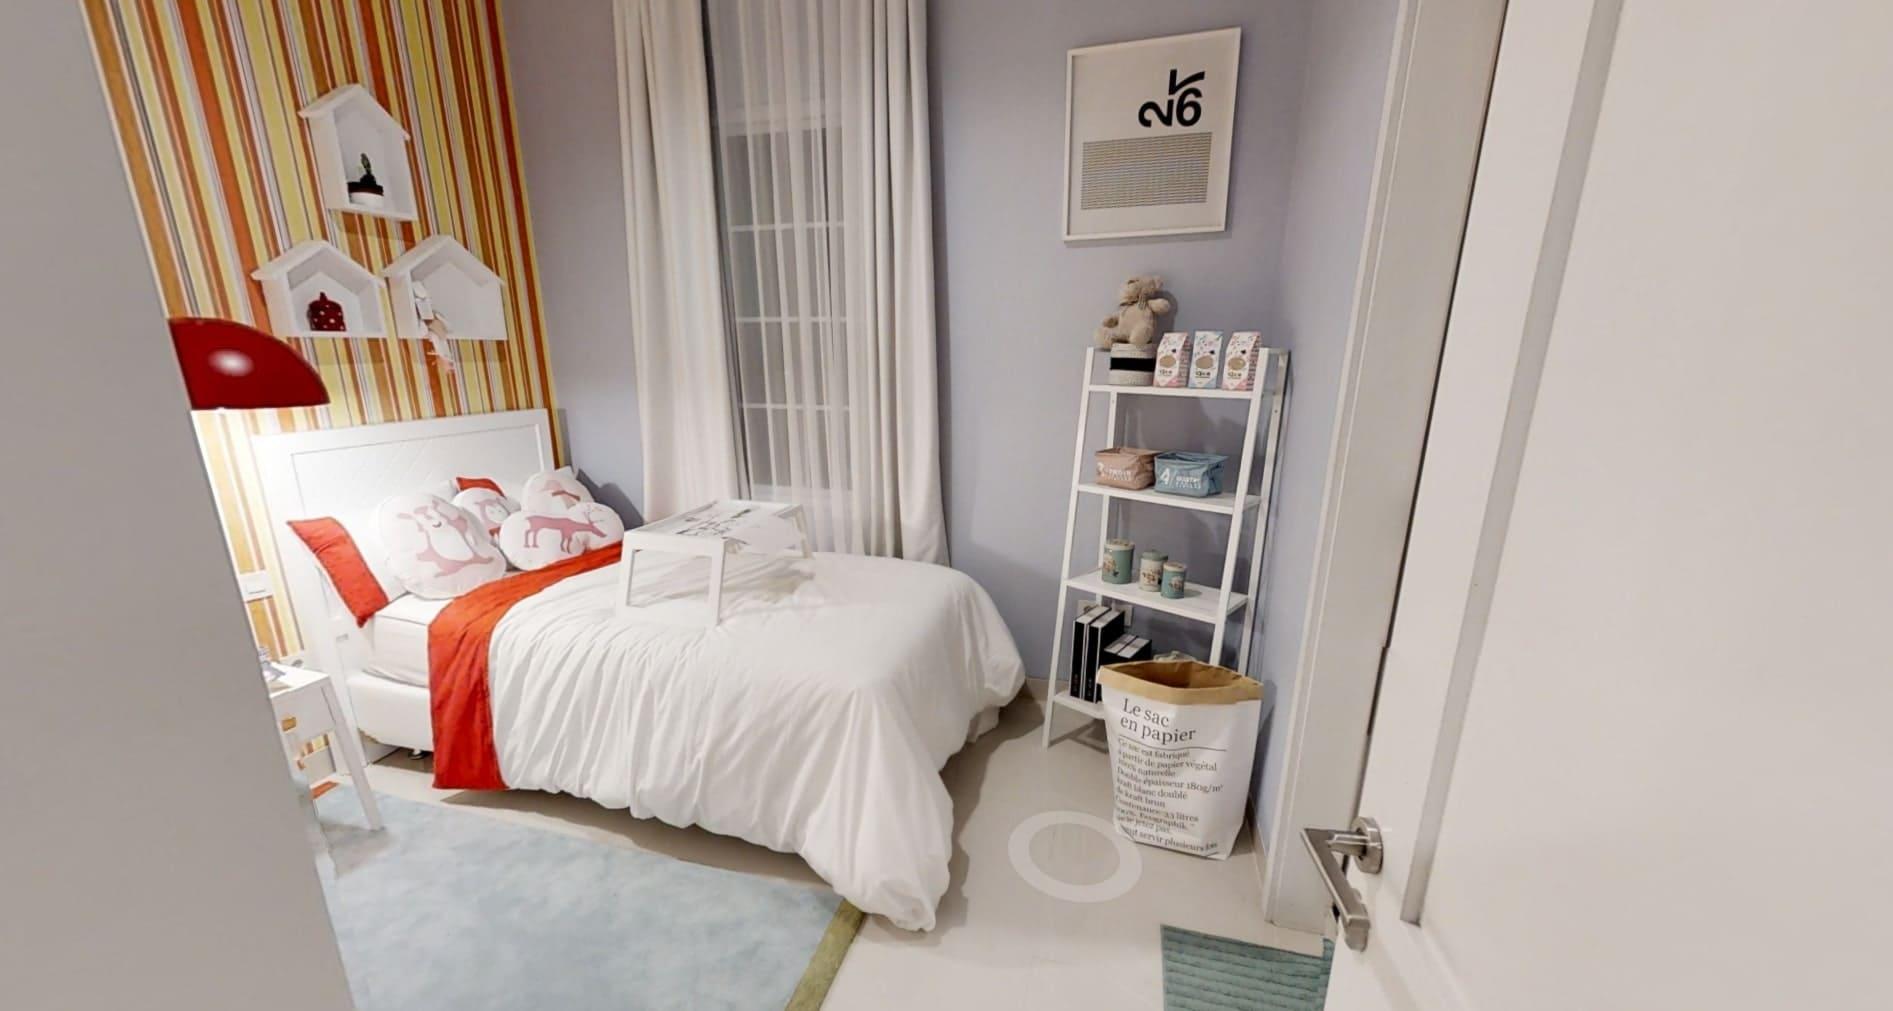 Tipe-164_180-Kids-Bedroom